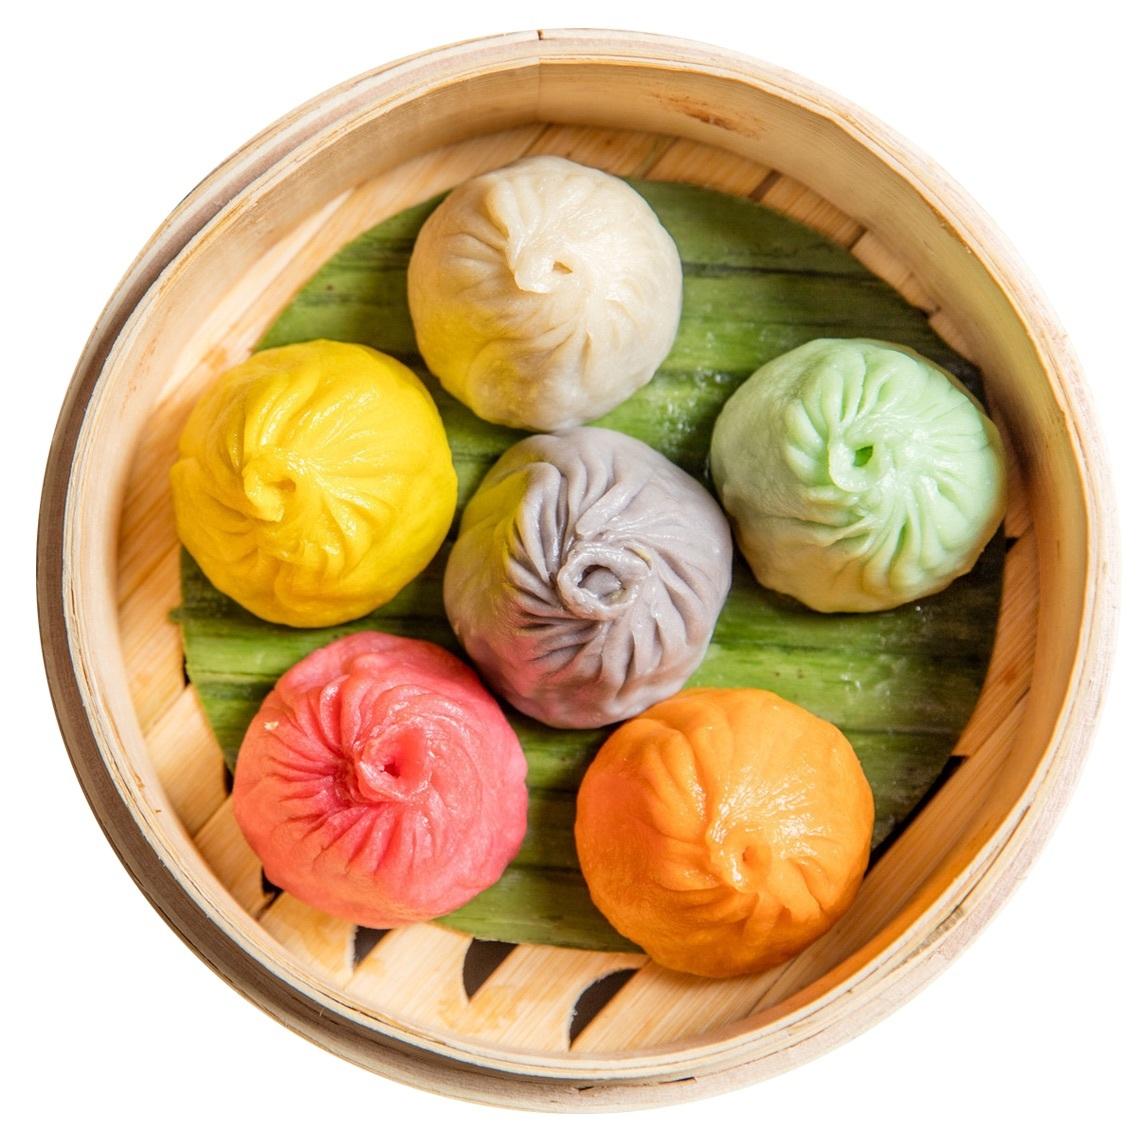 Celebrate Pride with these precious rainbow dumplings